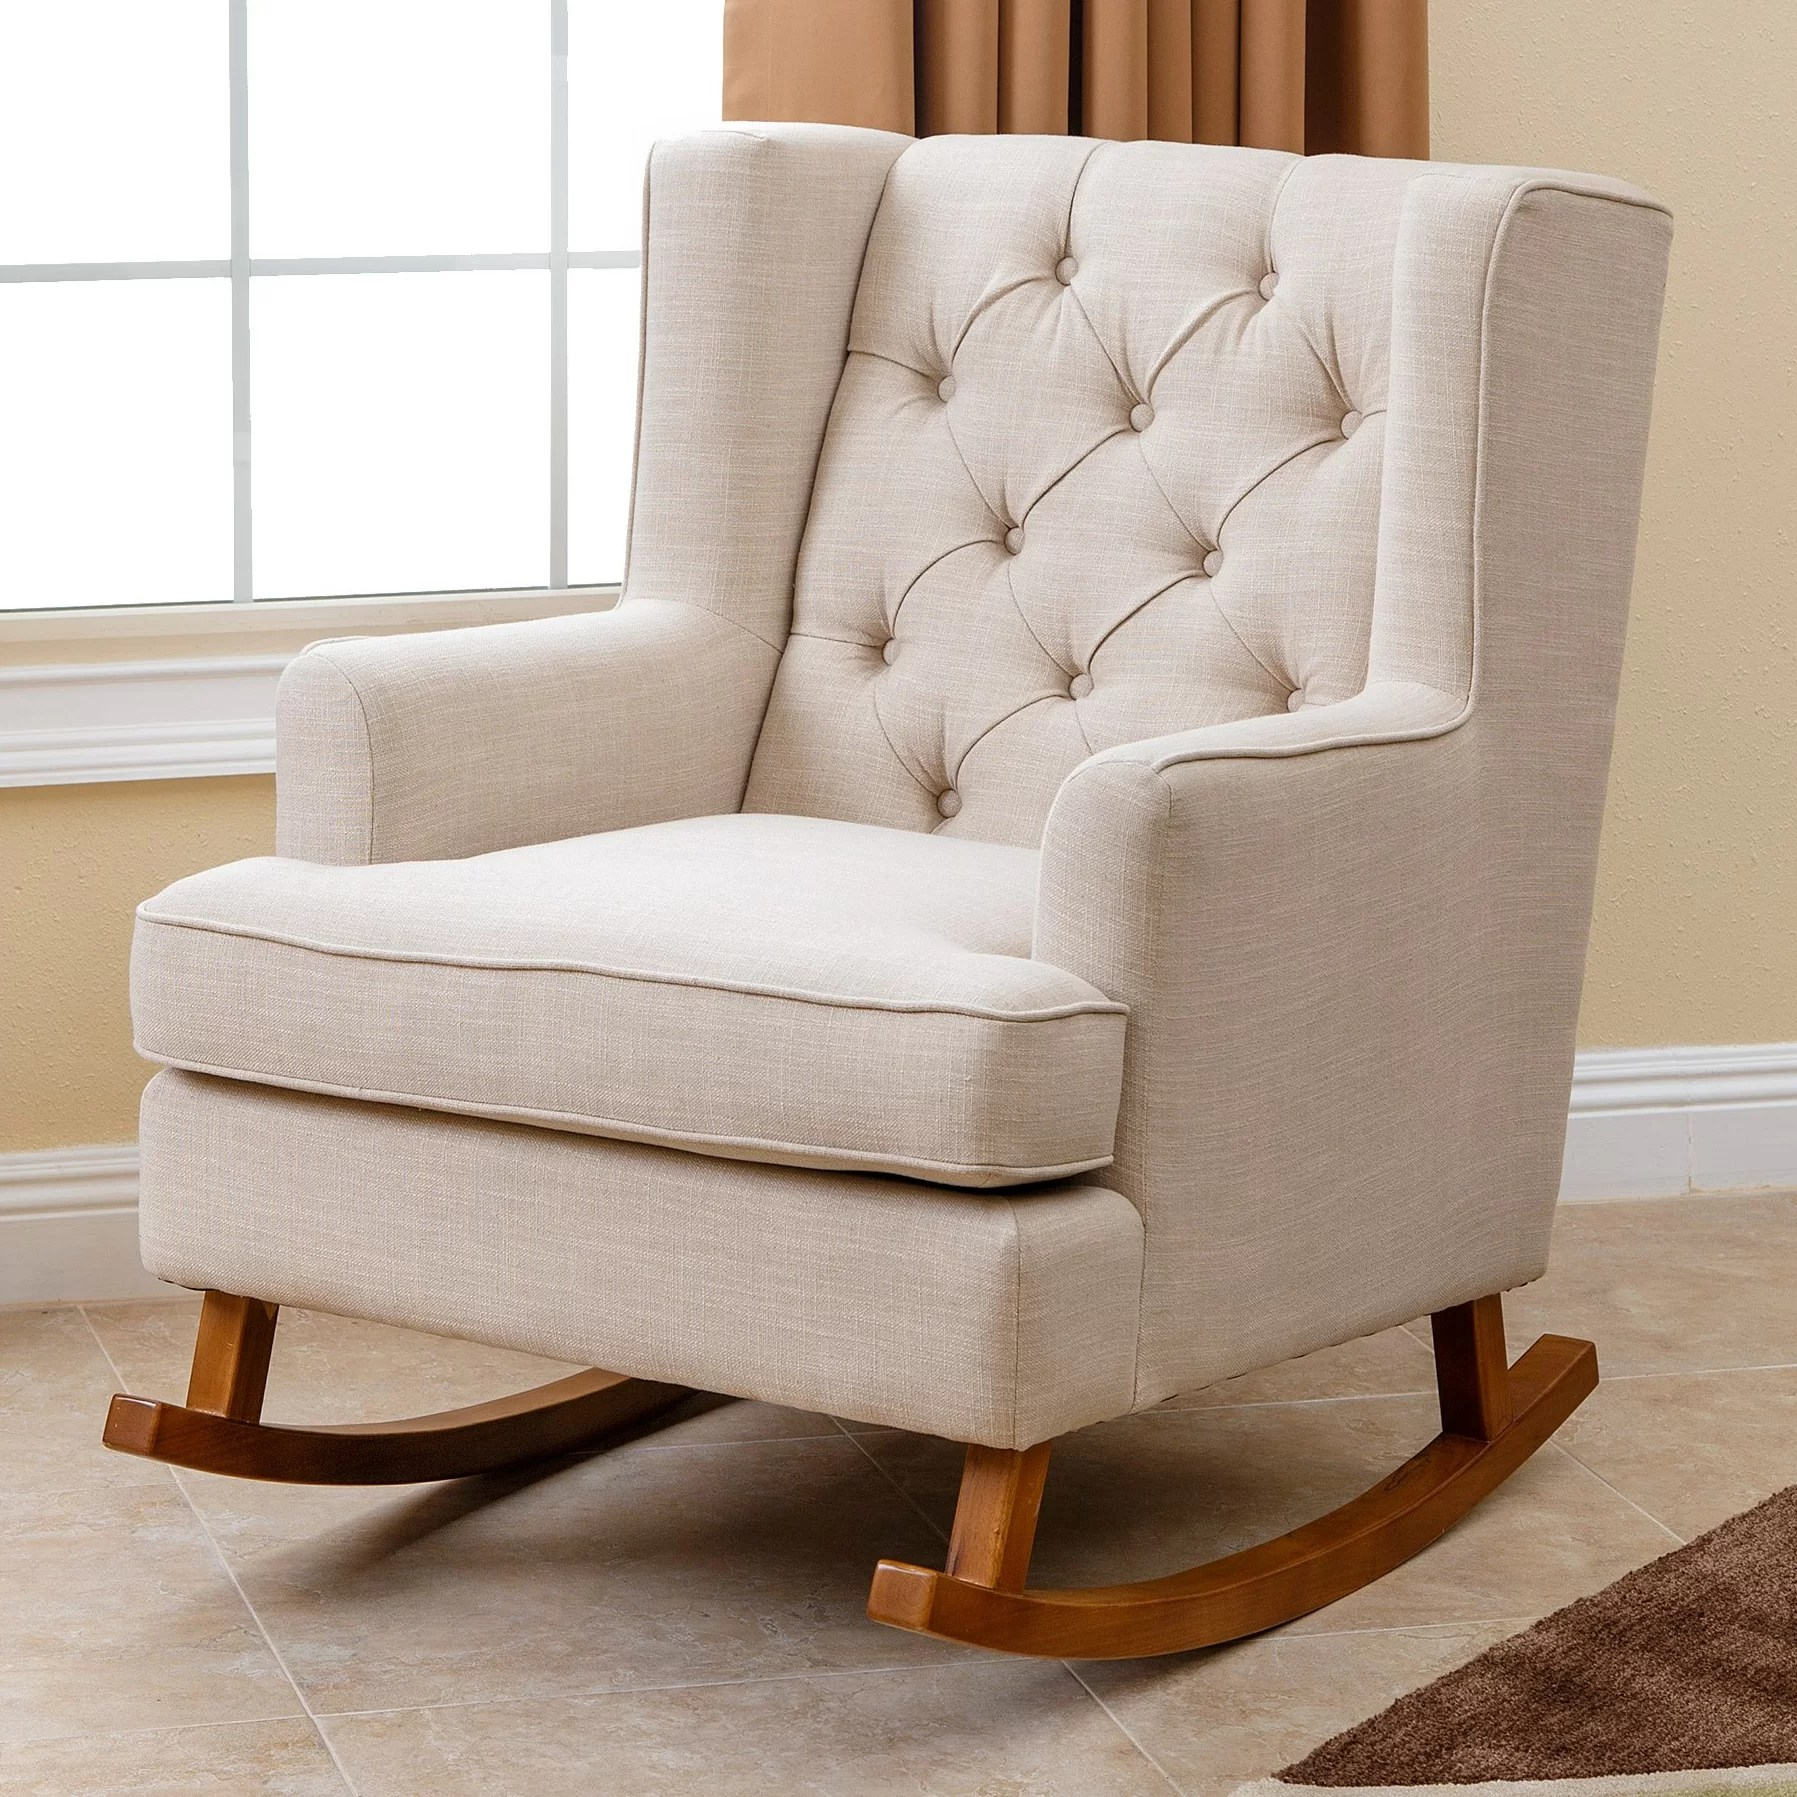 nursery rocker chair reviews bjs oversized aluminum rocking viv 43 rae anton and wayfair